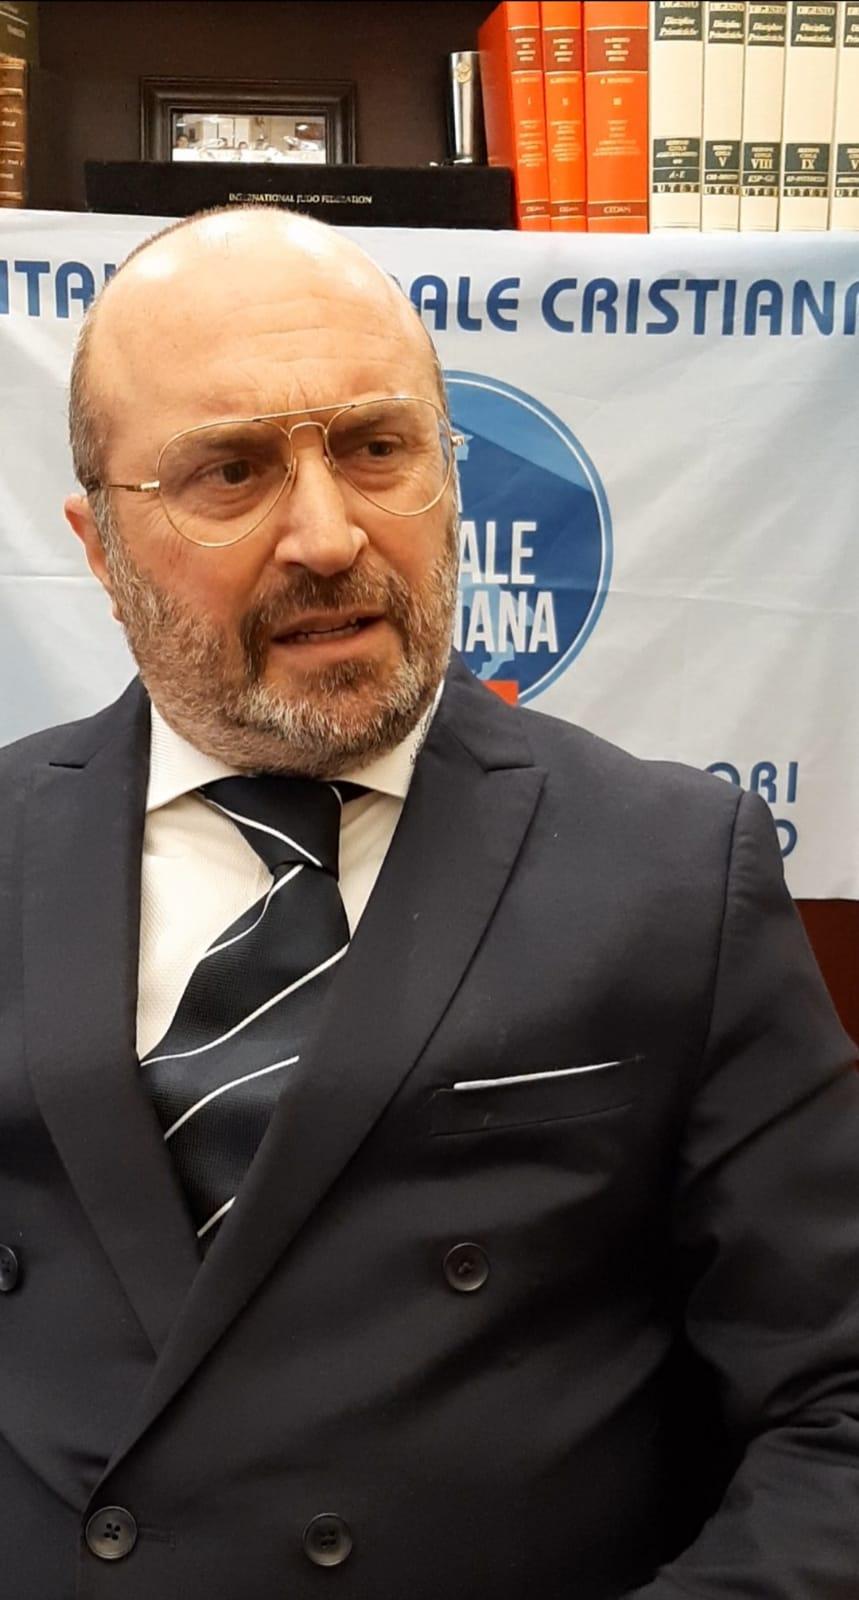 Fabio Campese, Presidente di Italia Liberale Cristiana